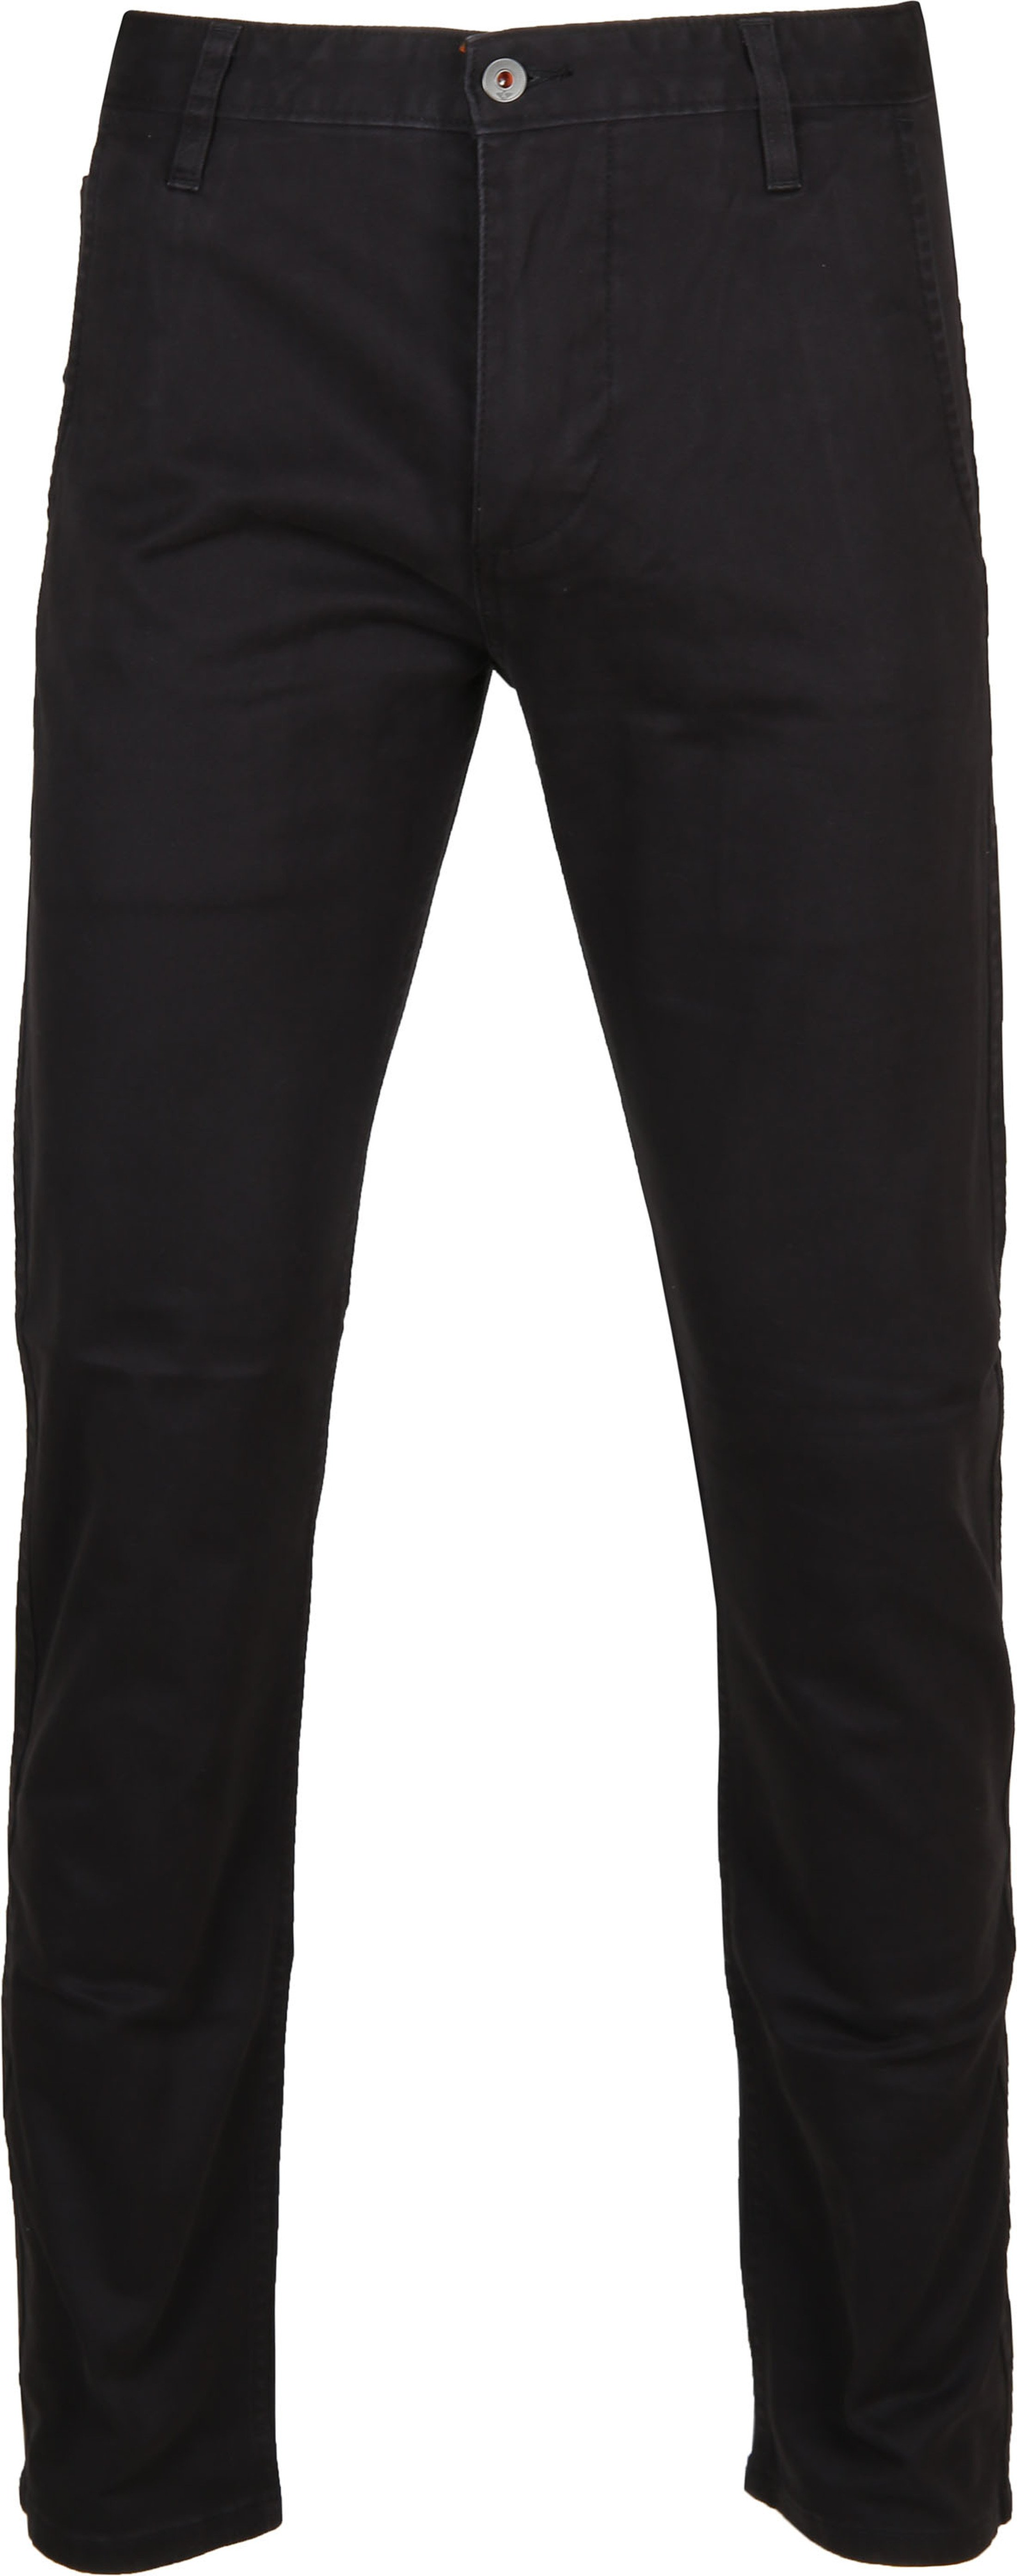 Dockers Trousers Alpha Stretch Black